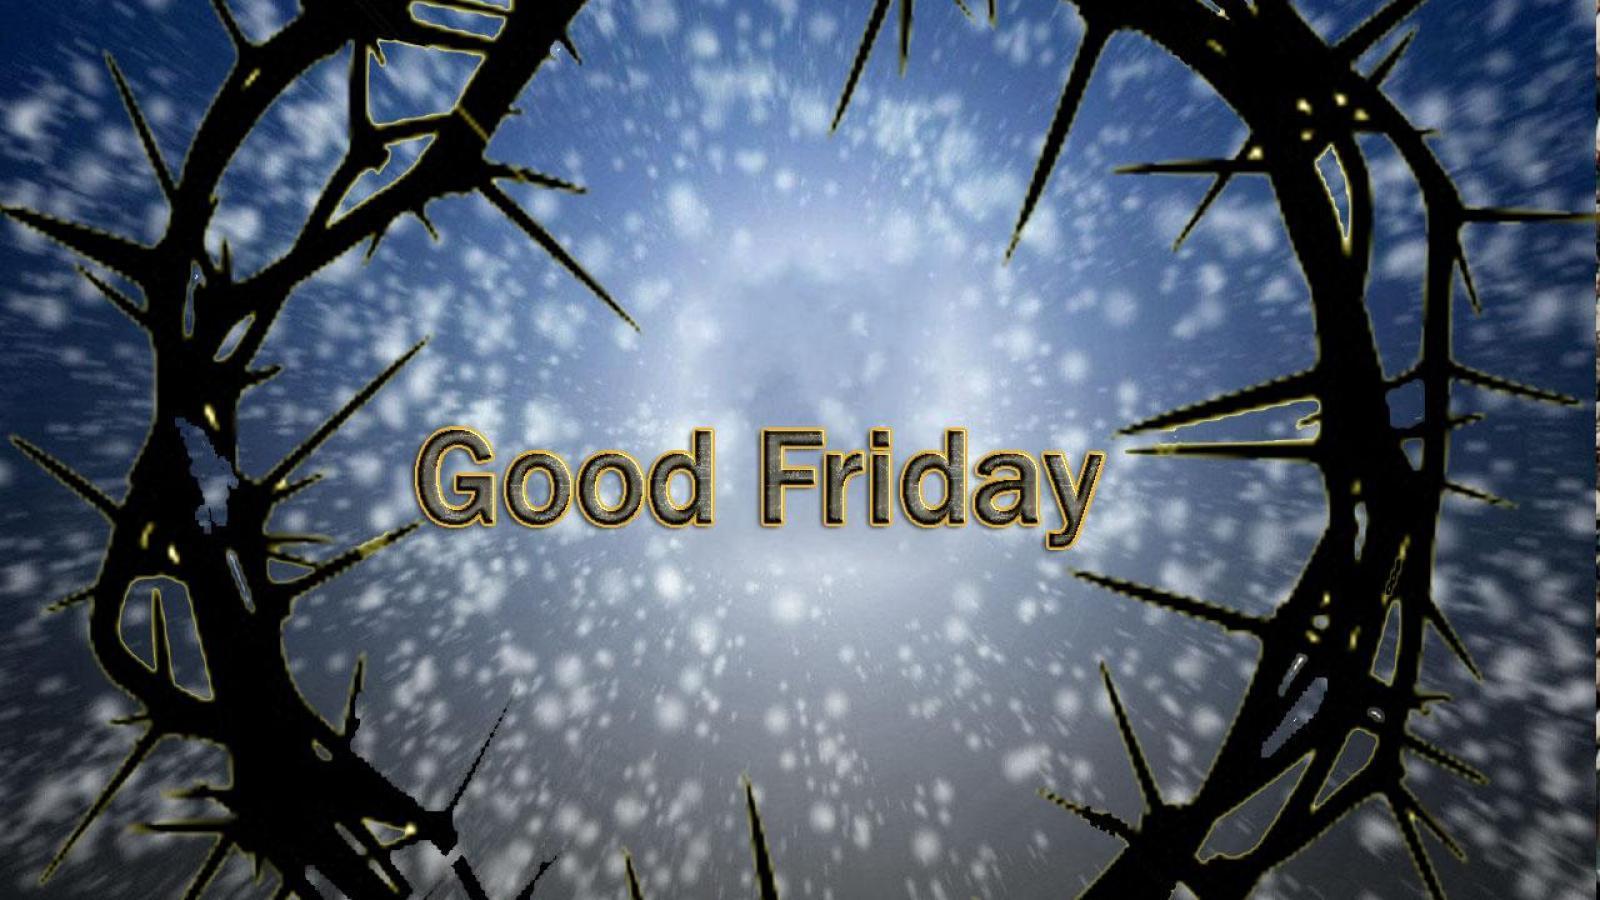 Good Friday Wallpaper Widescreen - WallpaperSafari | 1600 x 900 jpeg 166kB